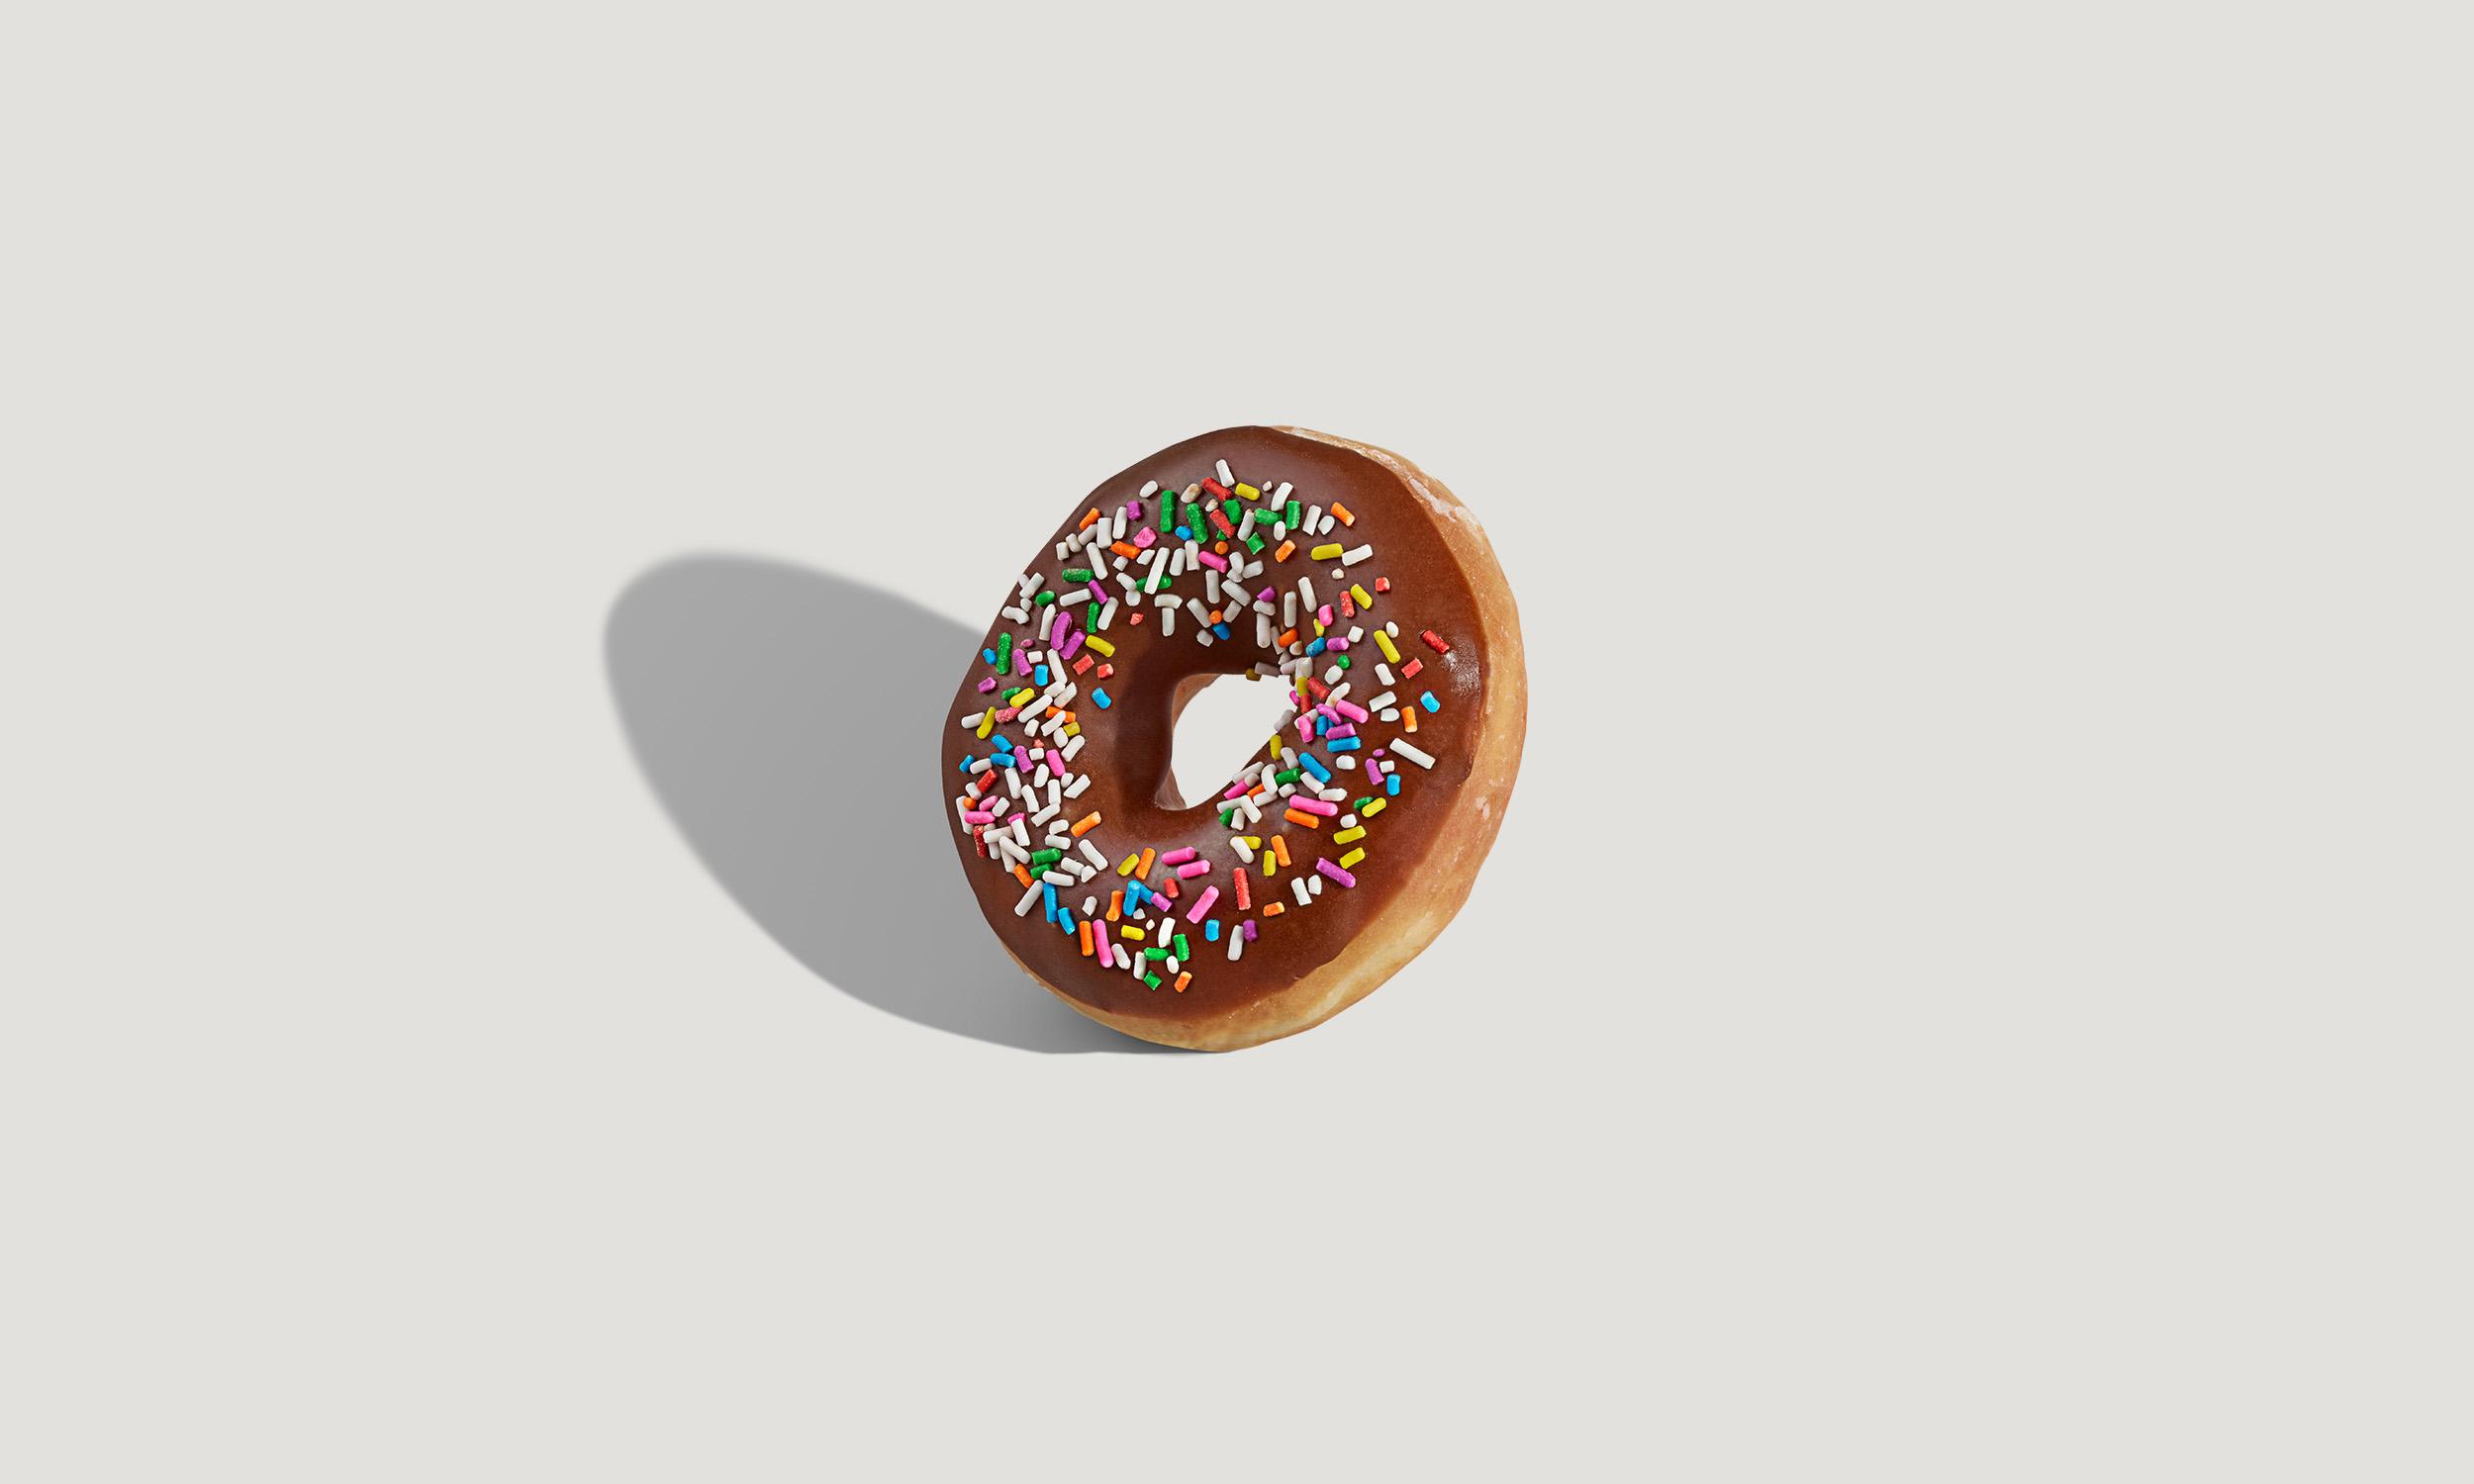 Speedway_IsometricProductPhotography_Donut-Sprinkles.jpg